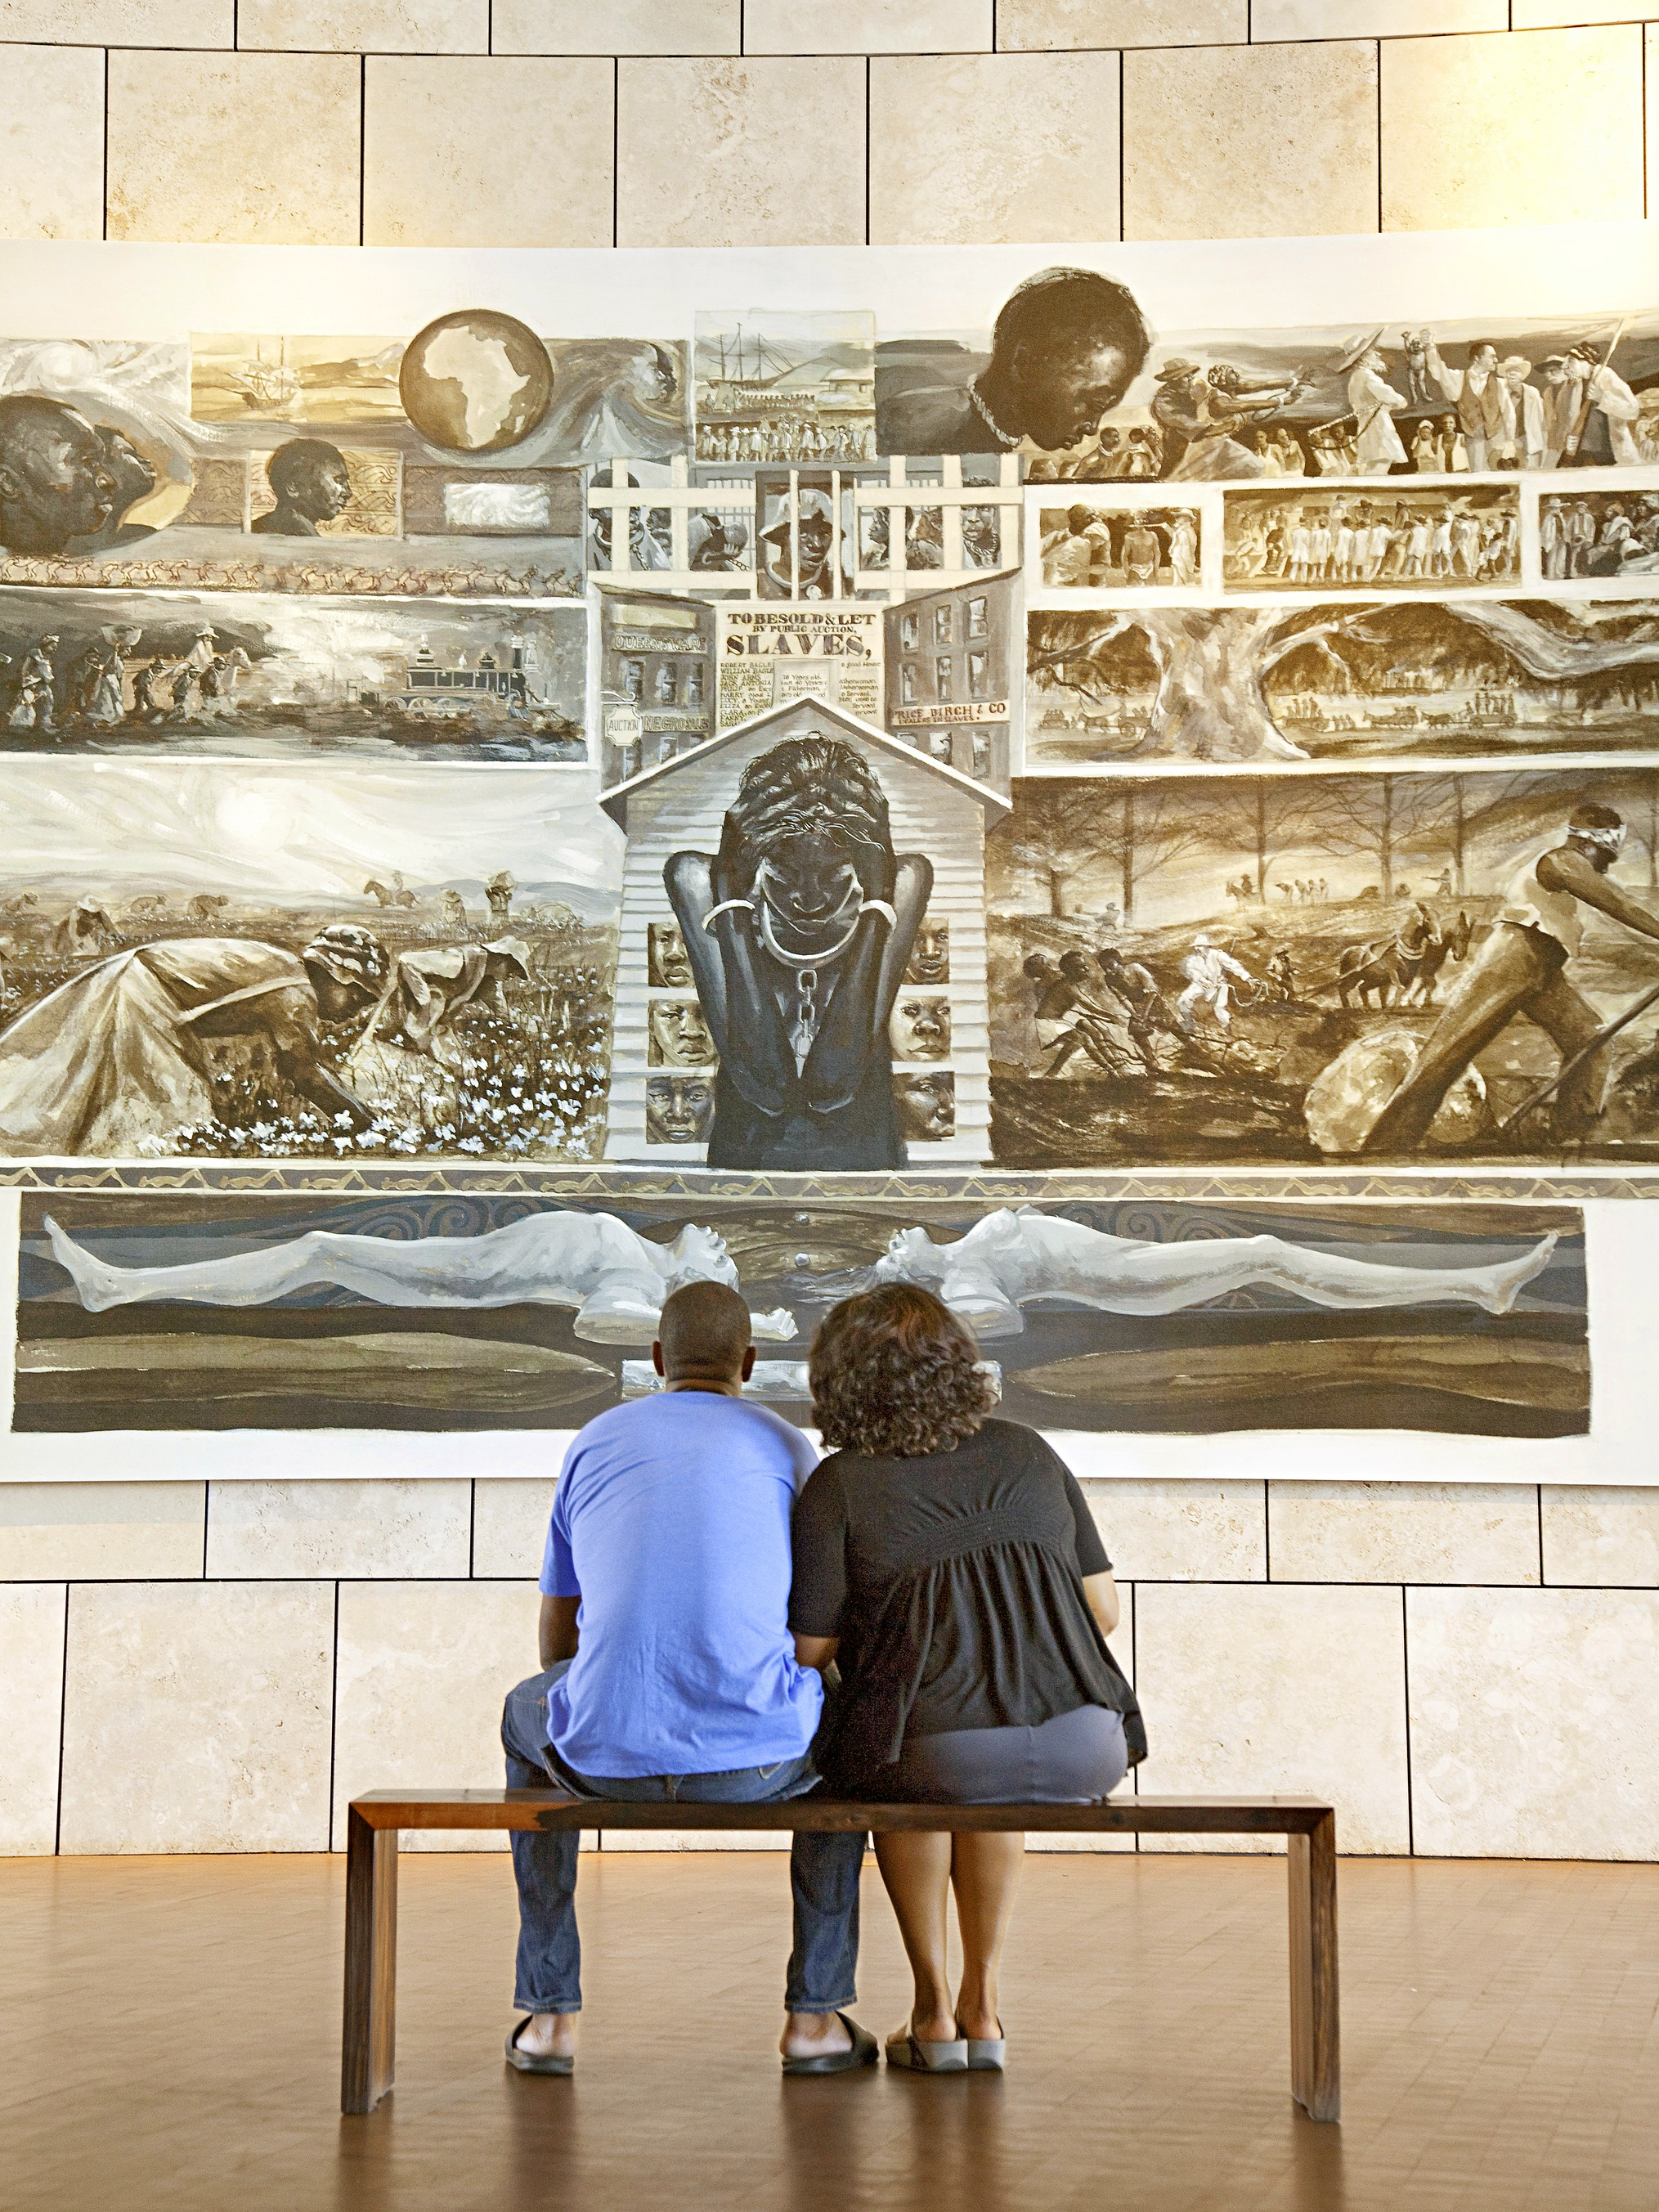 Cincinnati: National Underground Railroad Freedom Center